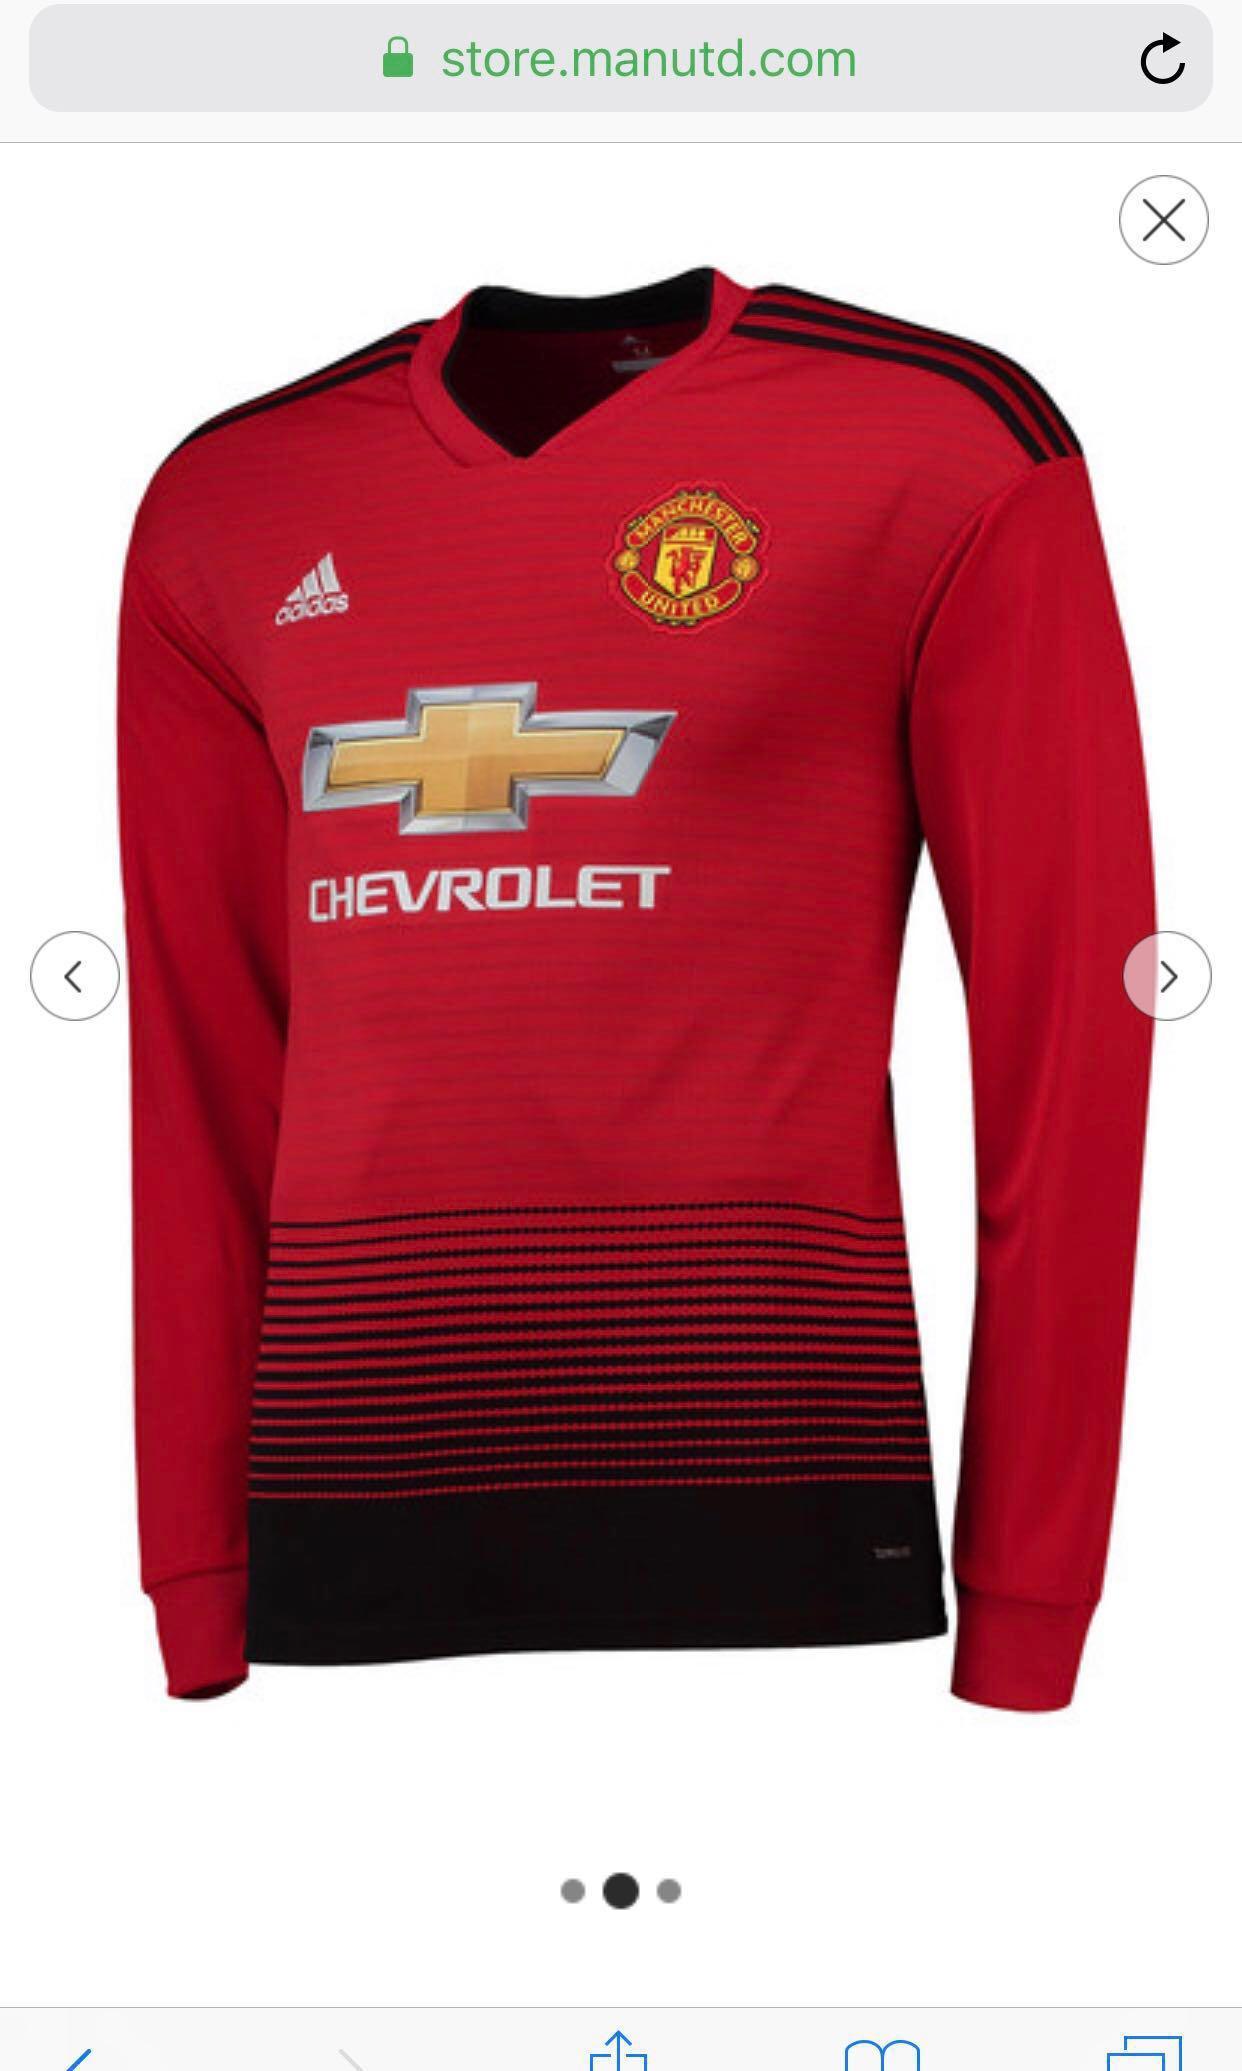 half off 88f81 3e6f8 Manchester United Home Shirt 2018-19 - Long Sleeve (XXXL ...